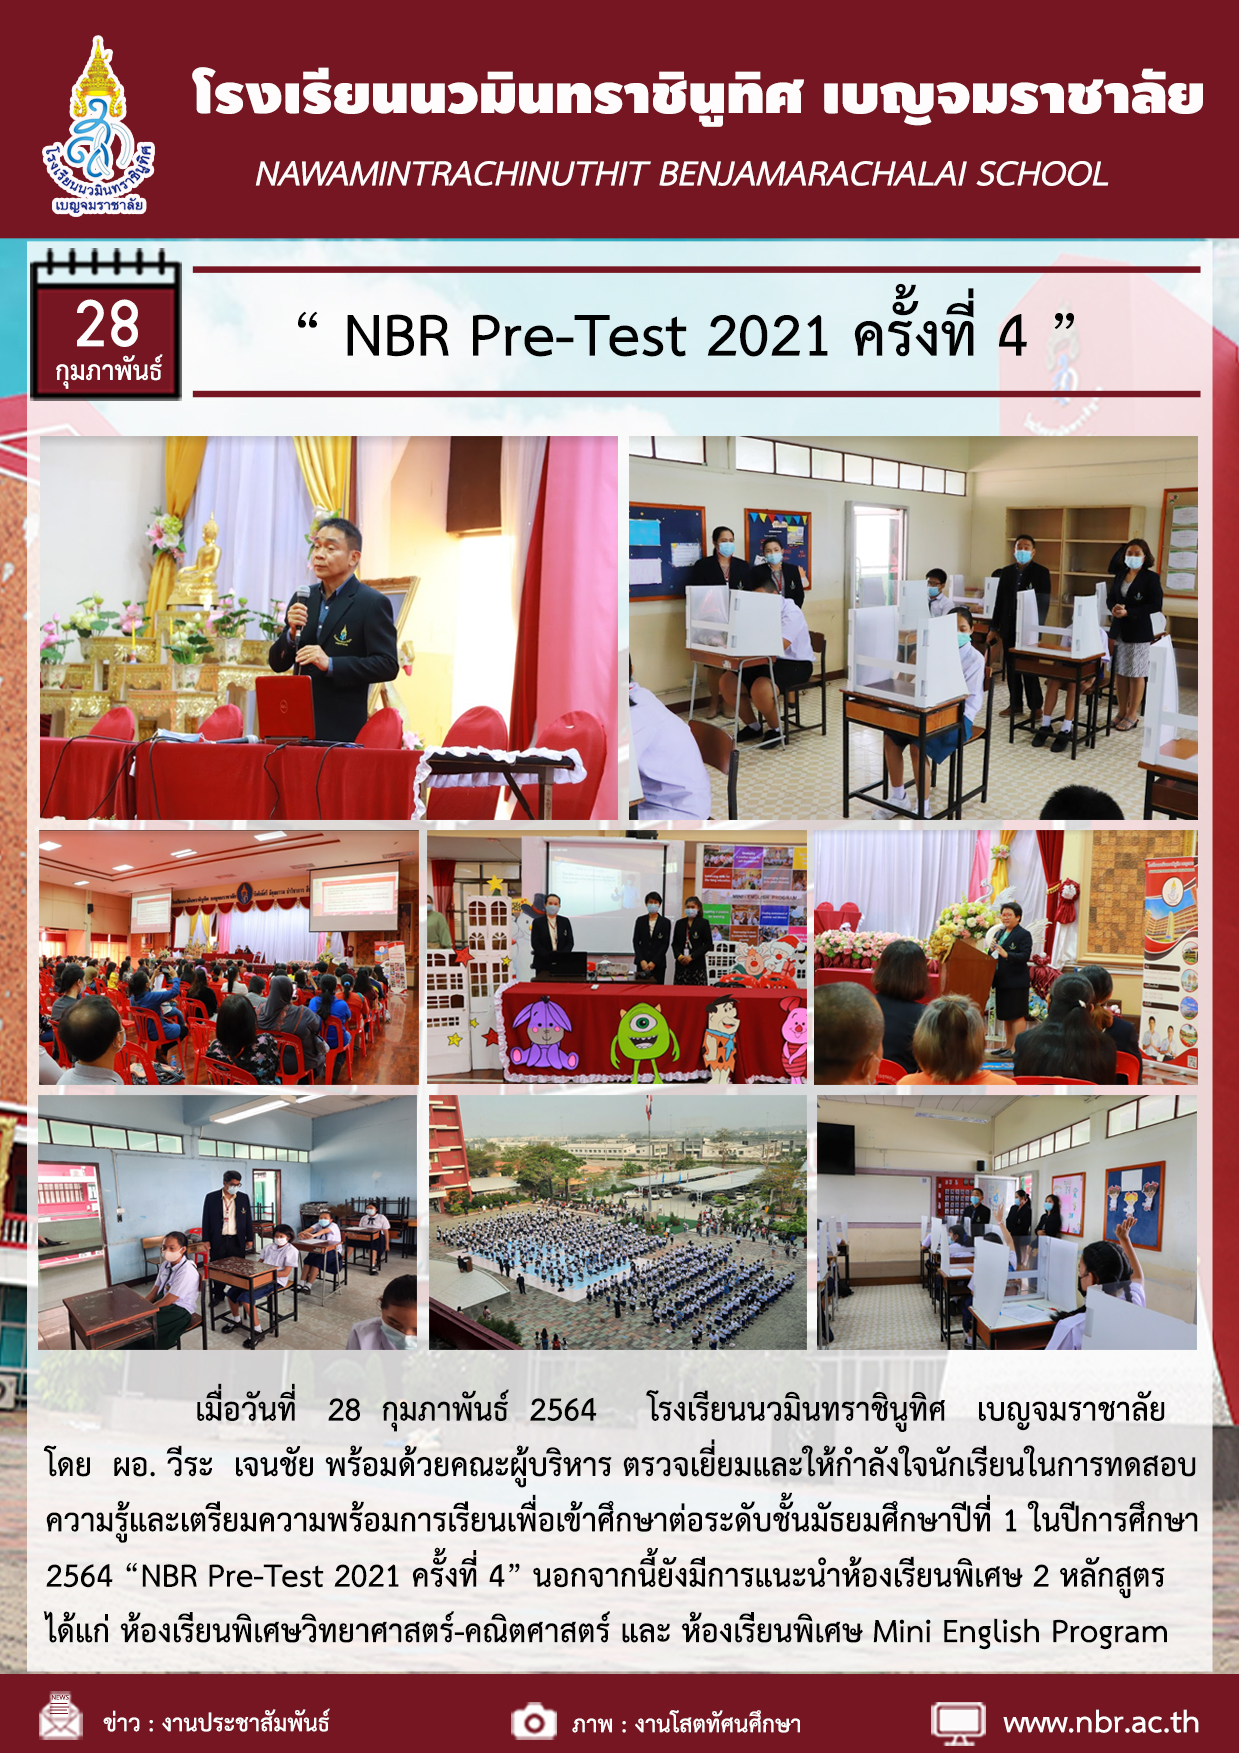 NBR Pre-Test 2021 ครั้งที่ 4